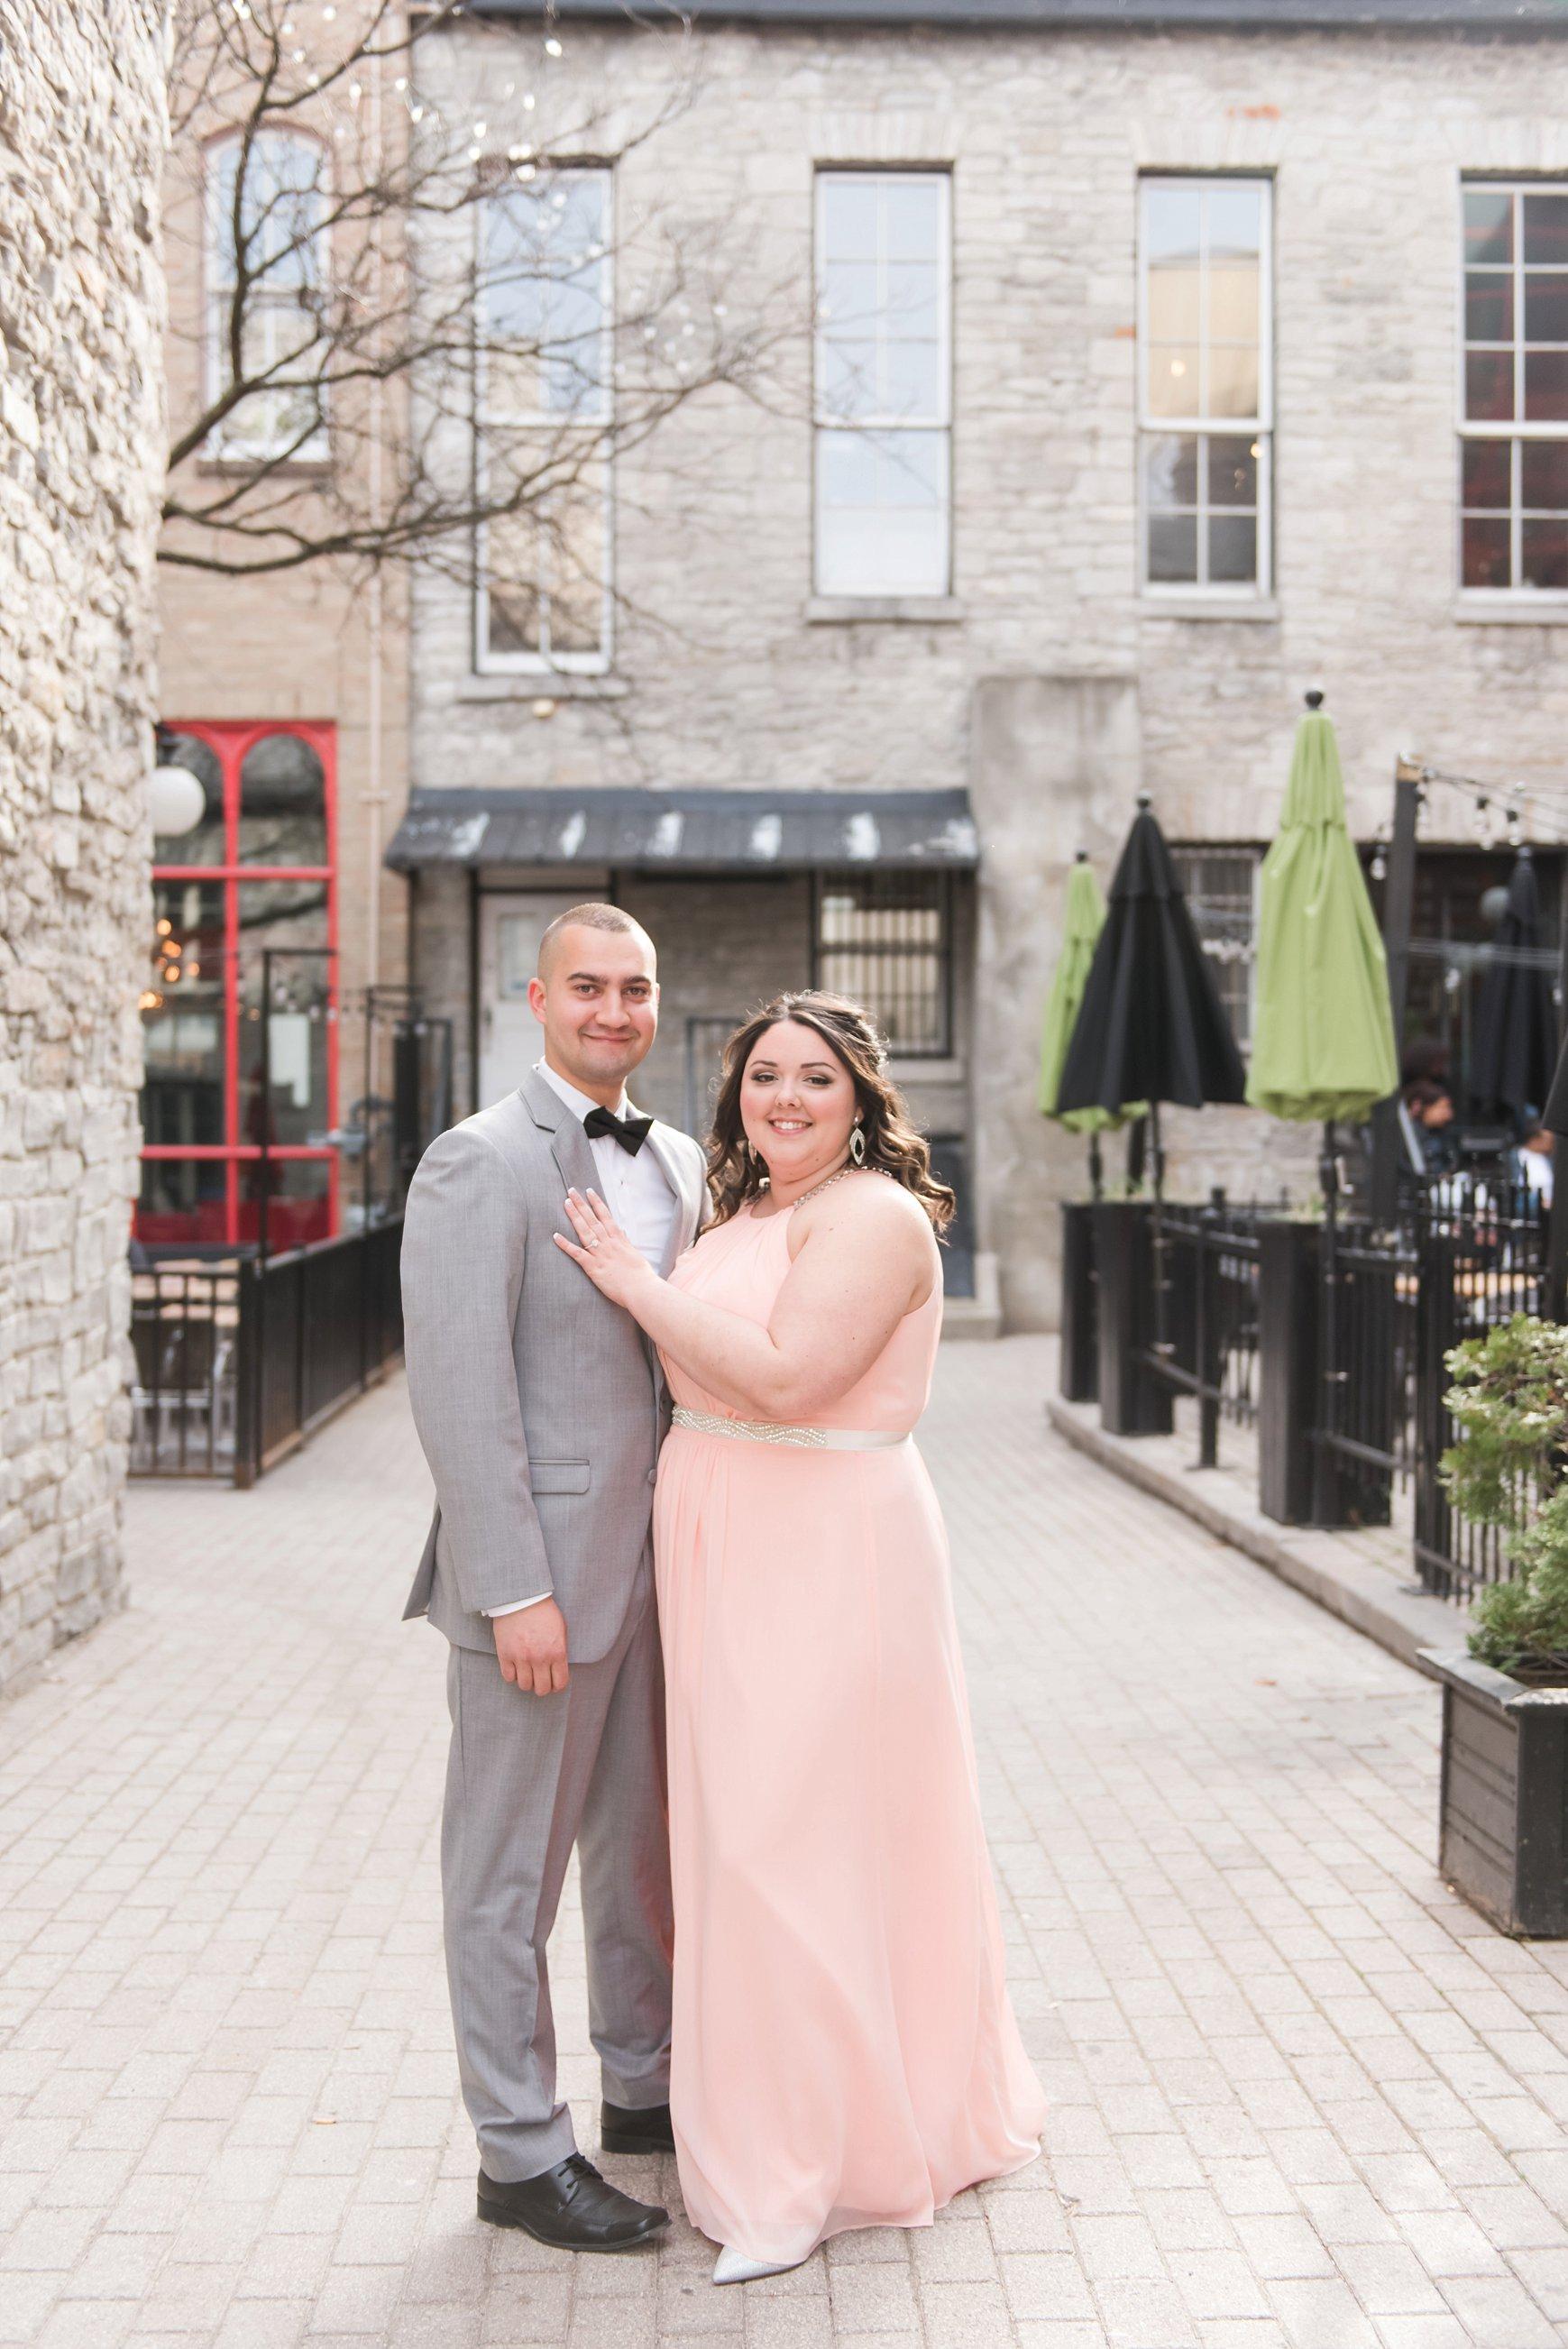 Sarmad Ashley Engagement Shoot- Ali Batoul Creatives Fine Art Wedding Photography_0043.jpg